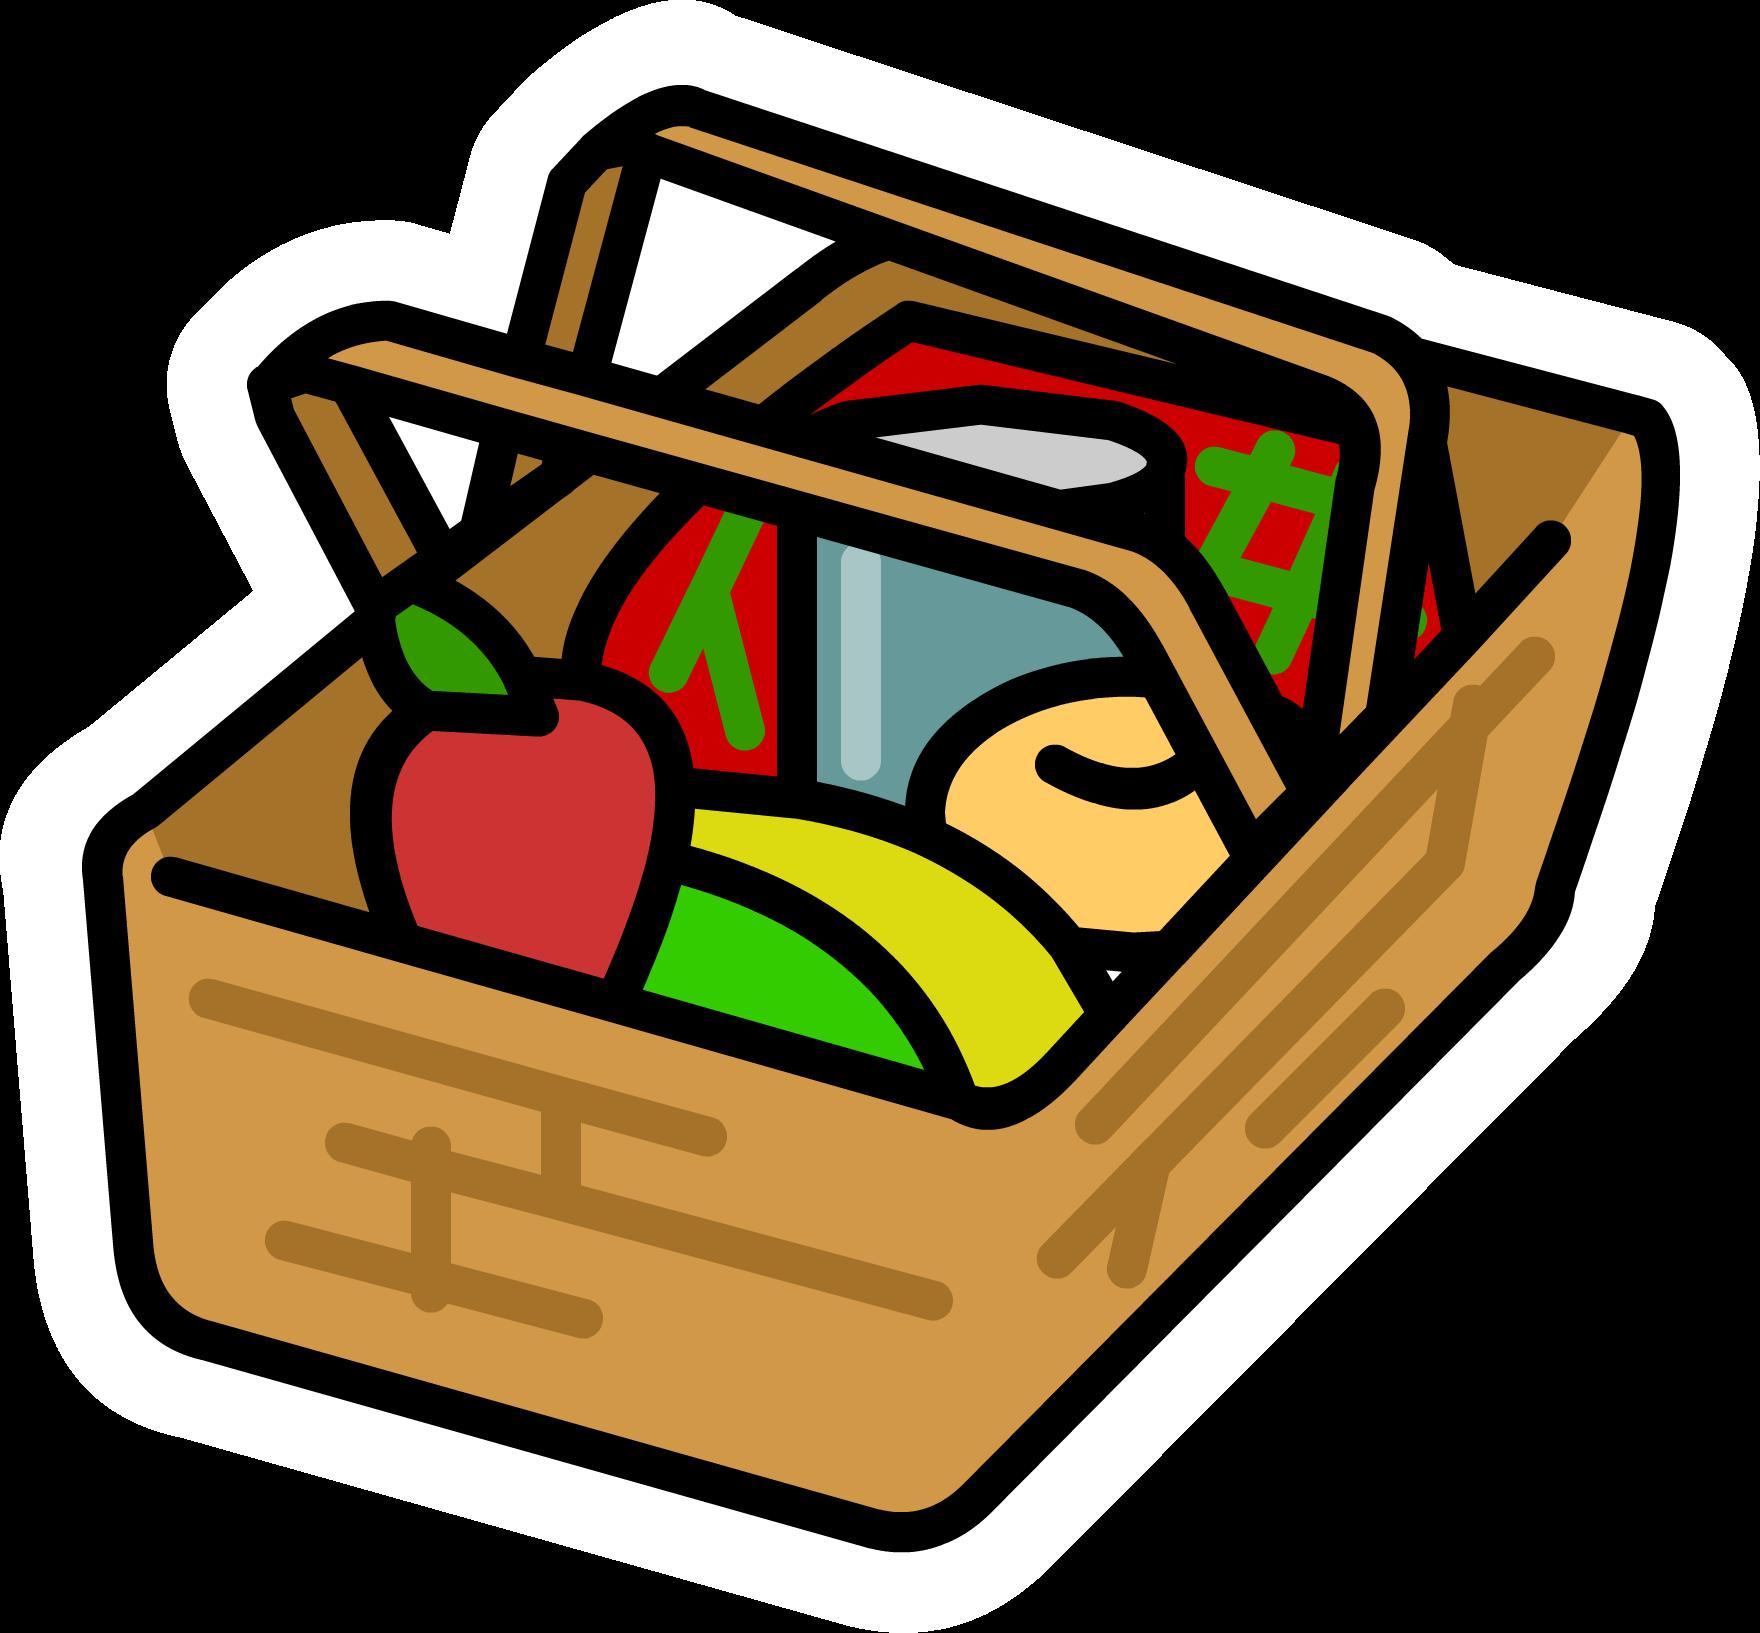 Image Picnic Basket Pin Png Club Penguin Wiki Fandom